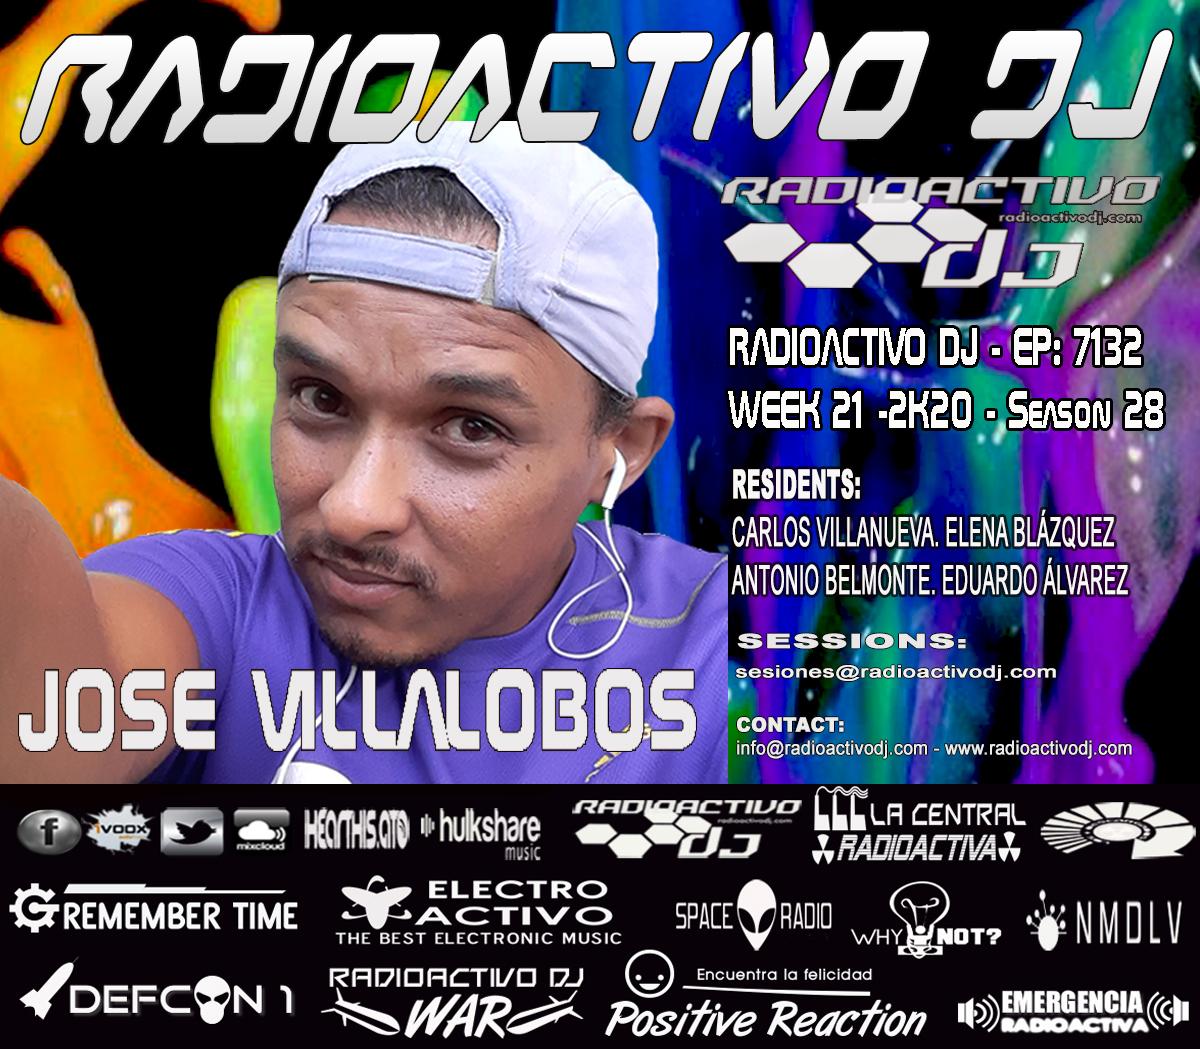 RADIOACTIVO-DJ-21-2020